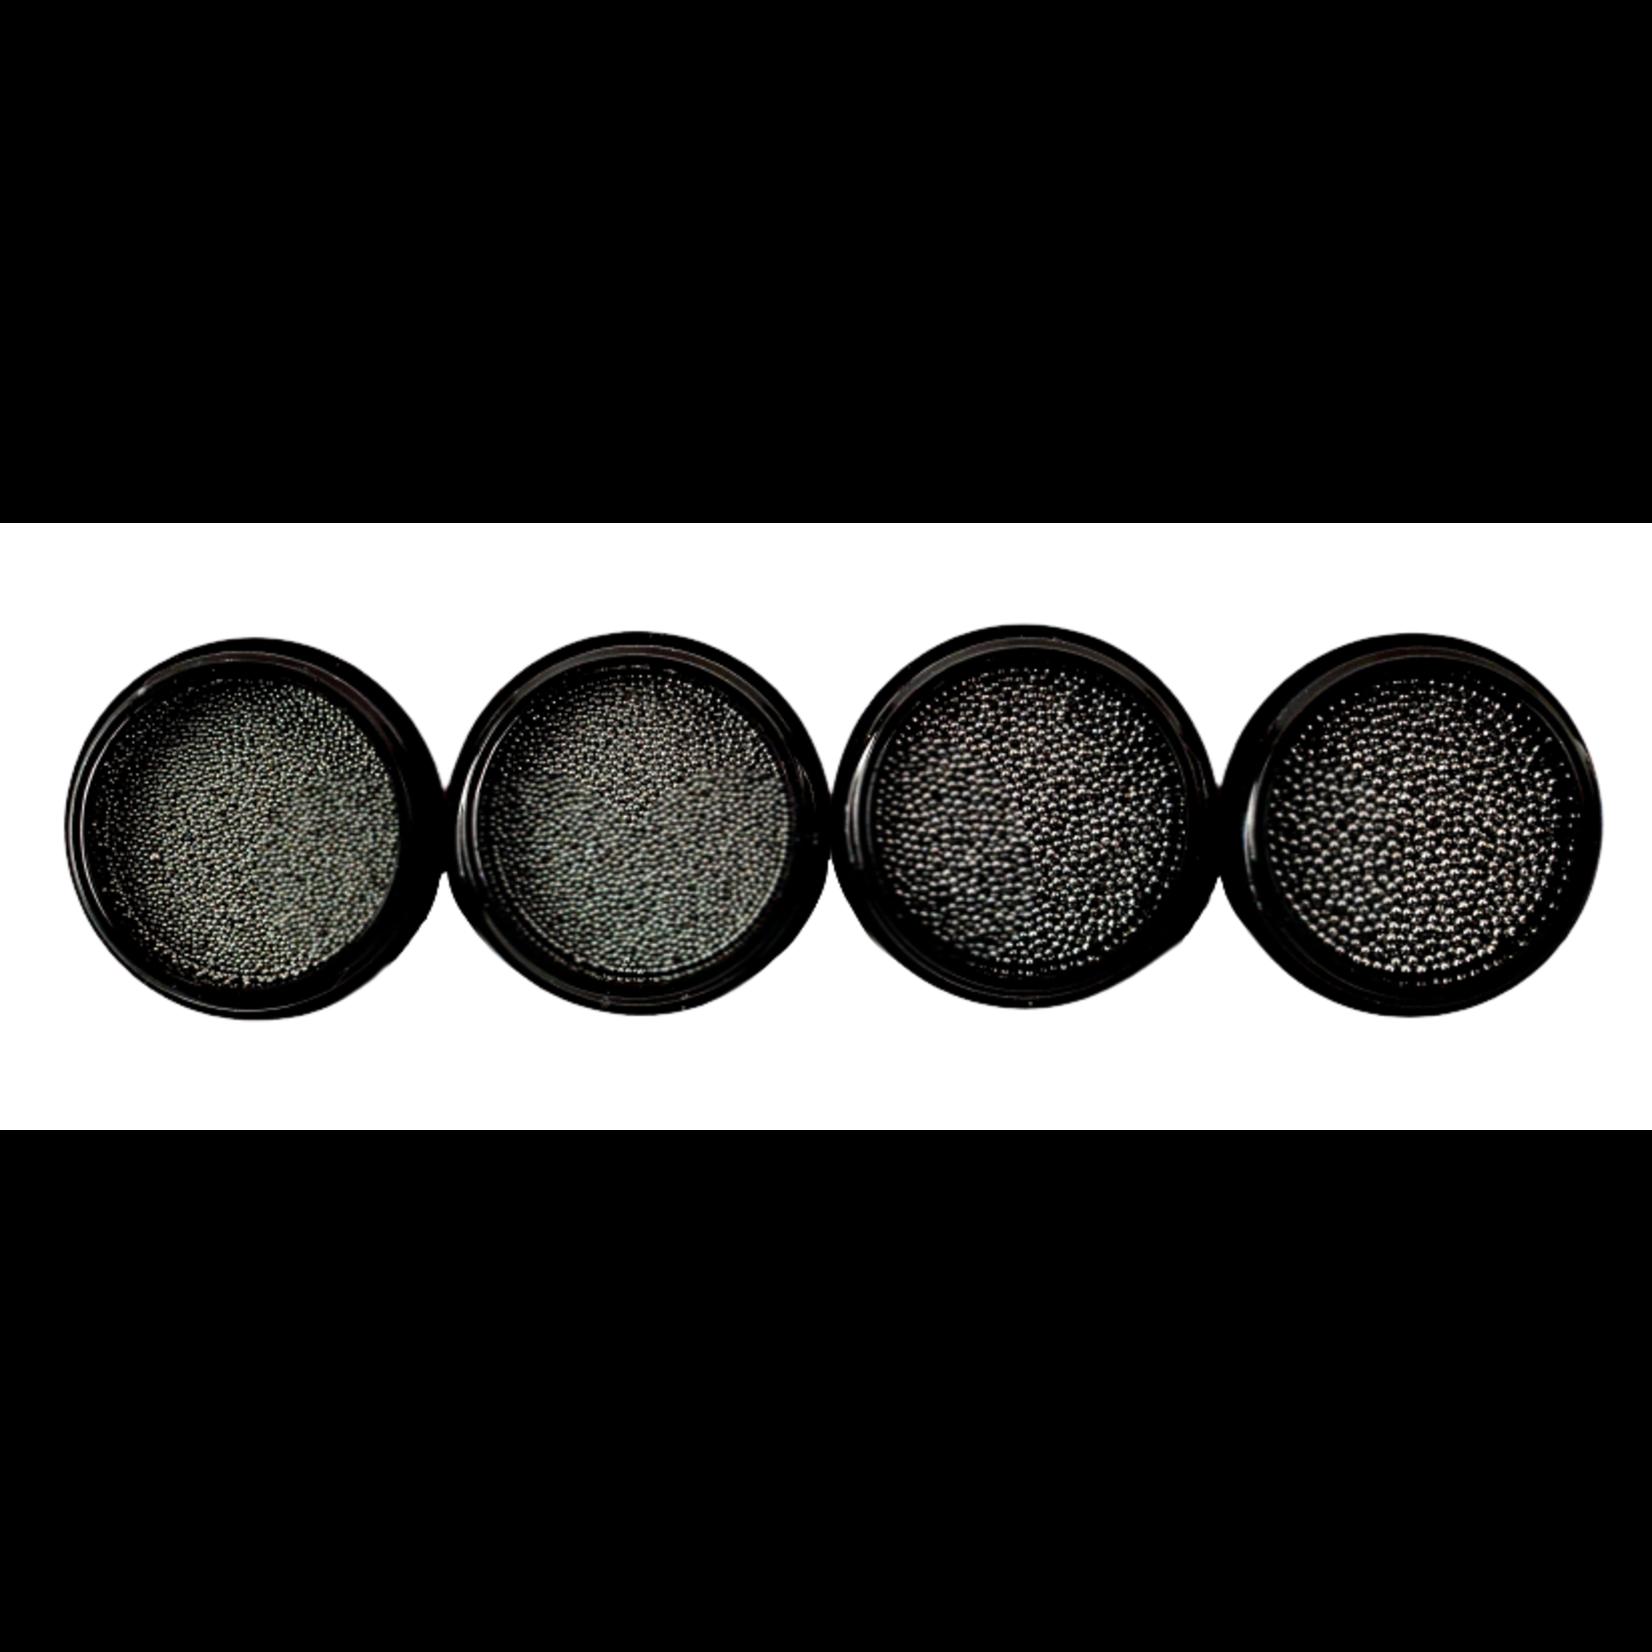 Urban Nails Caviar Beads Gun Metal Black 0.8